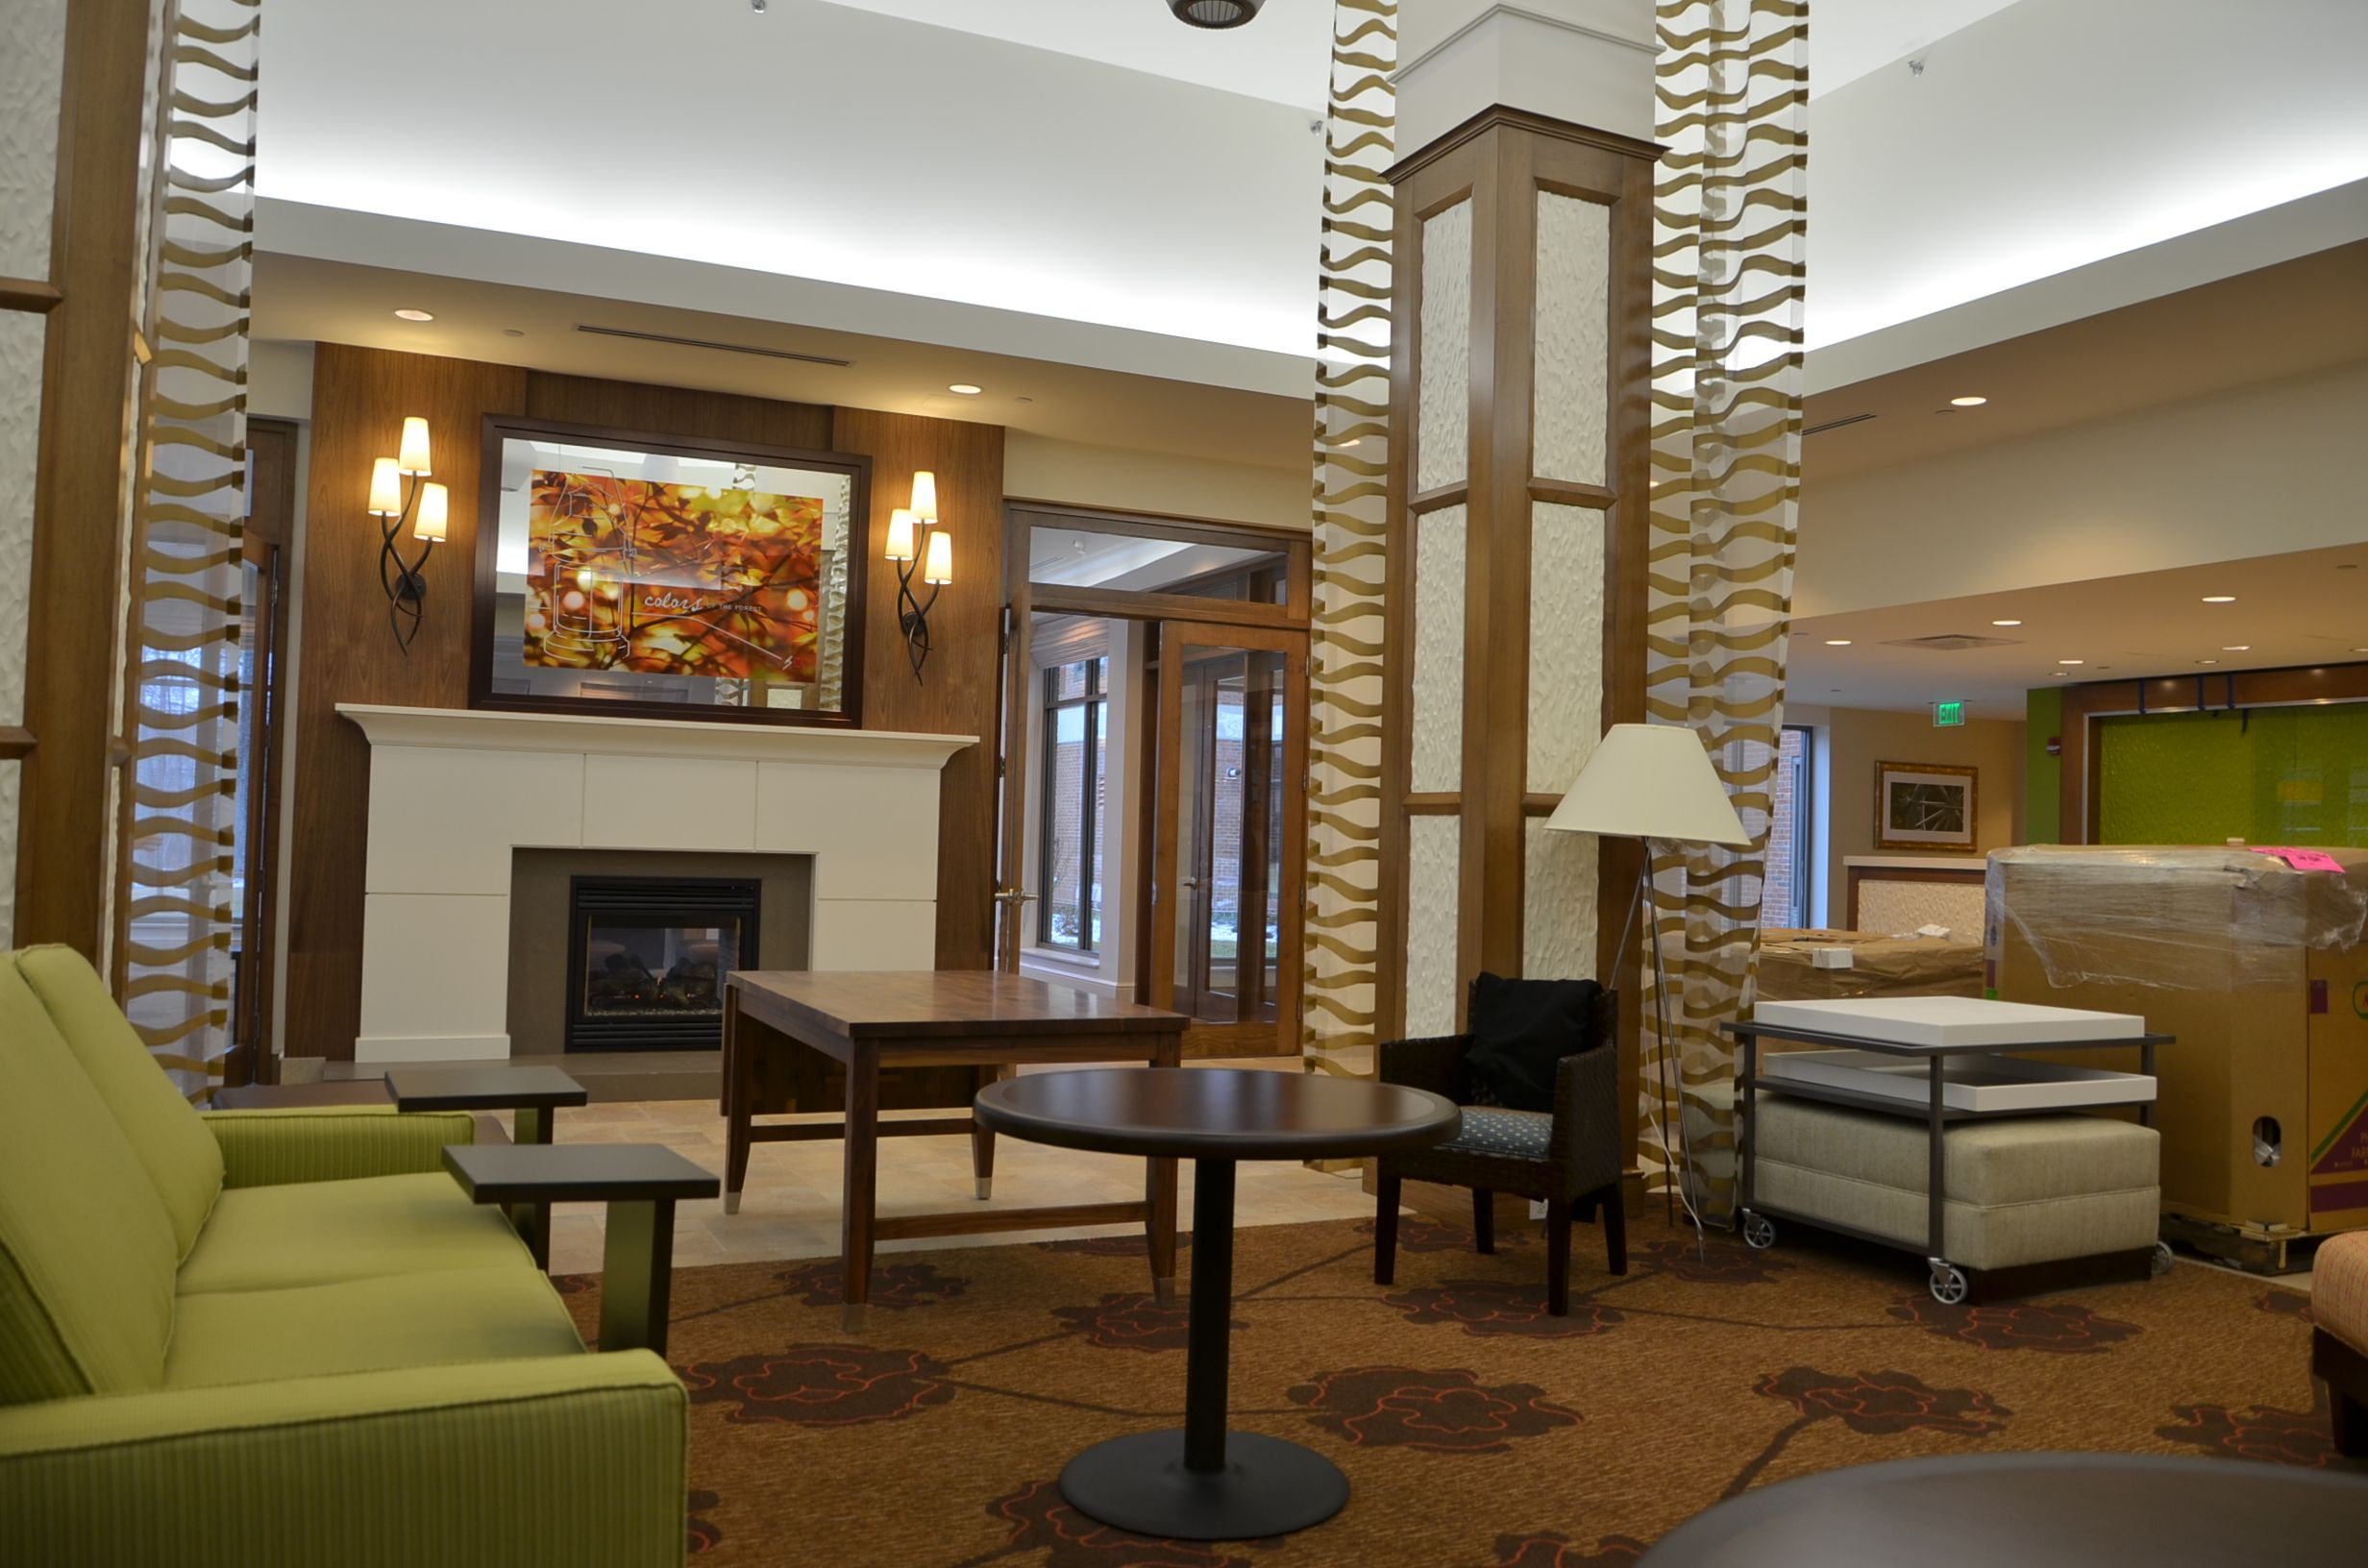 hilton garden inn lobby - Google Search | LS Condos. | Pinterest ...